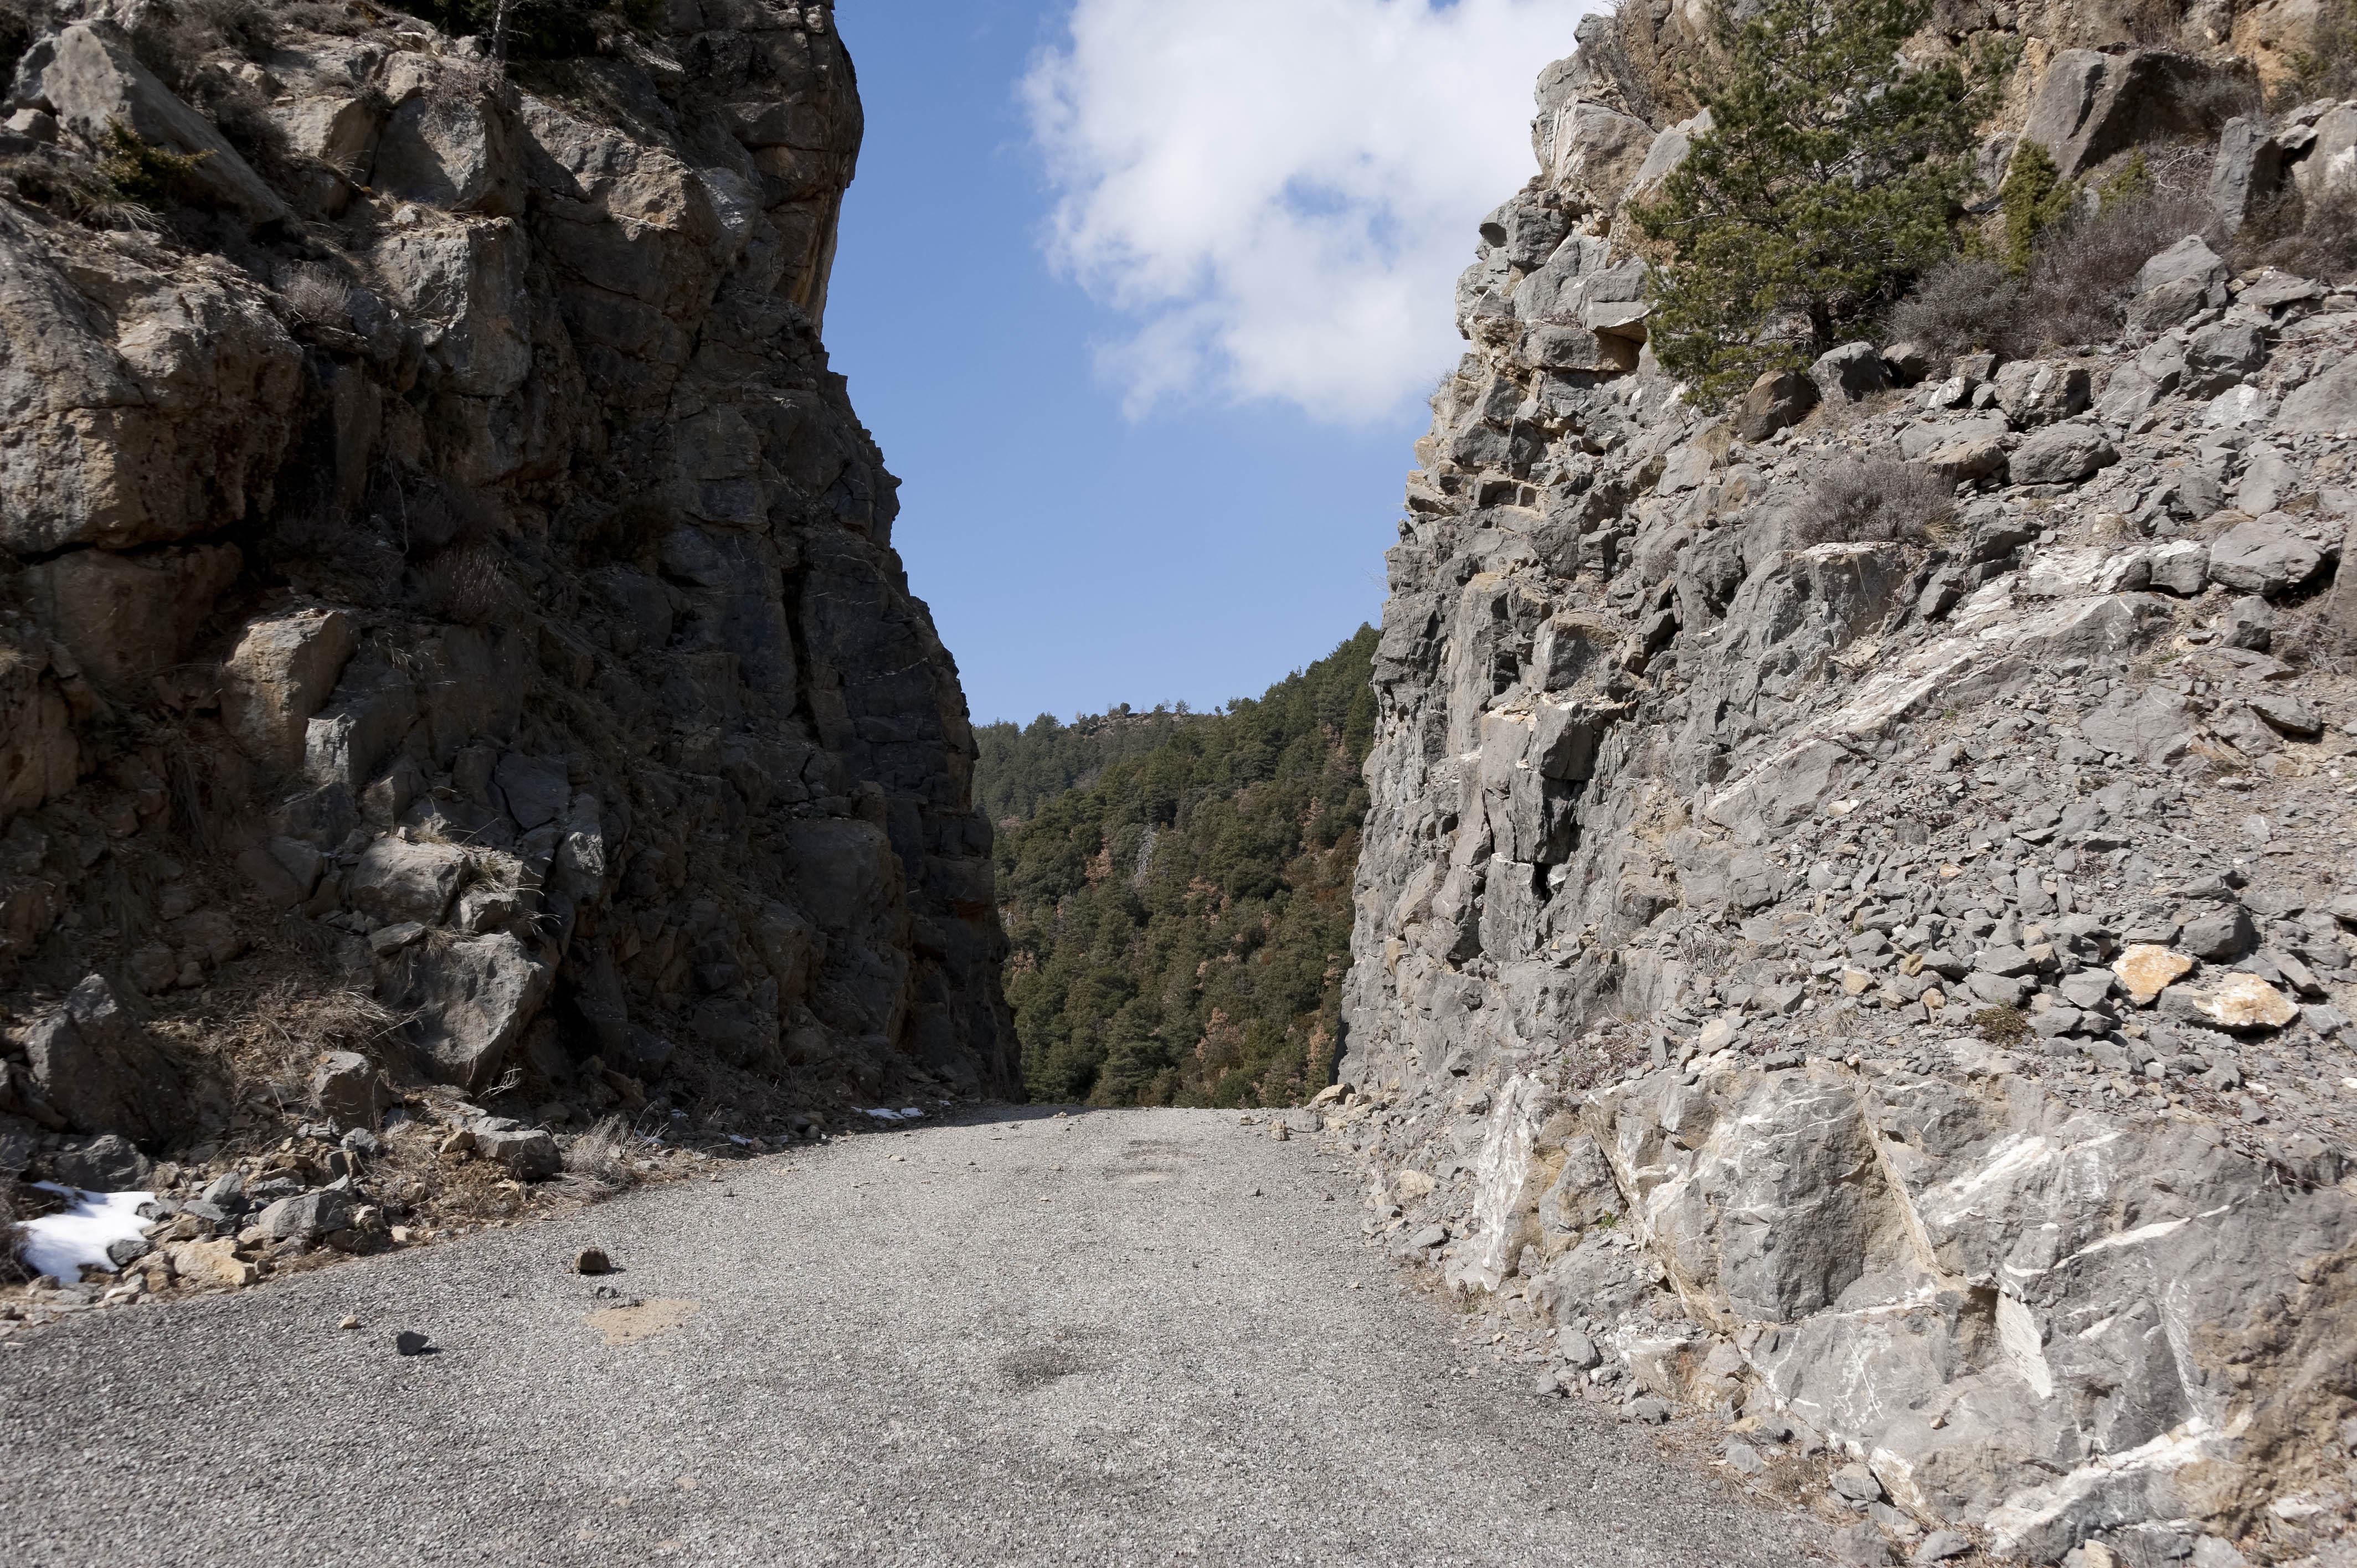 5457_col entre Campol et Yebra (Sobrarbe Aragon)